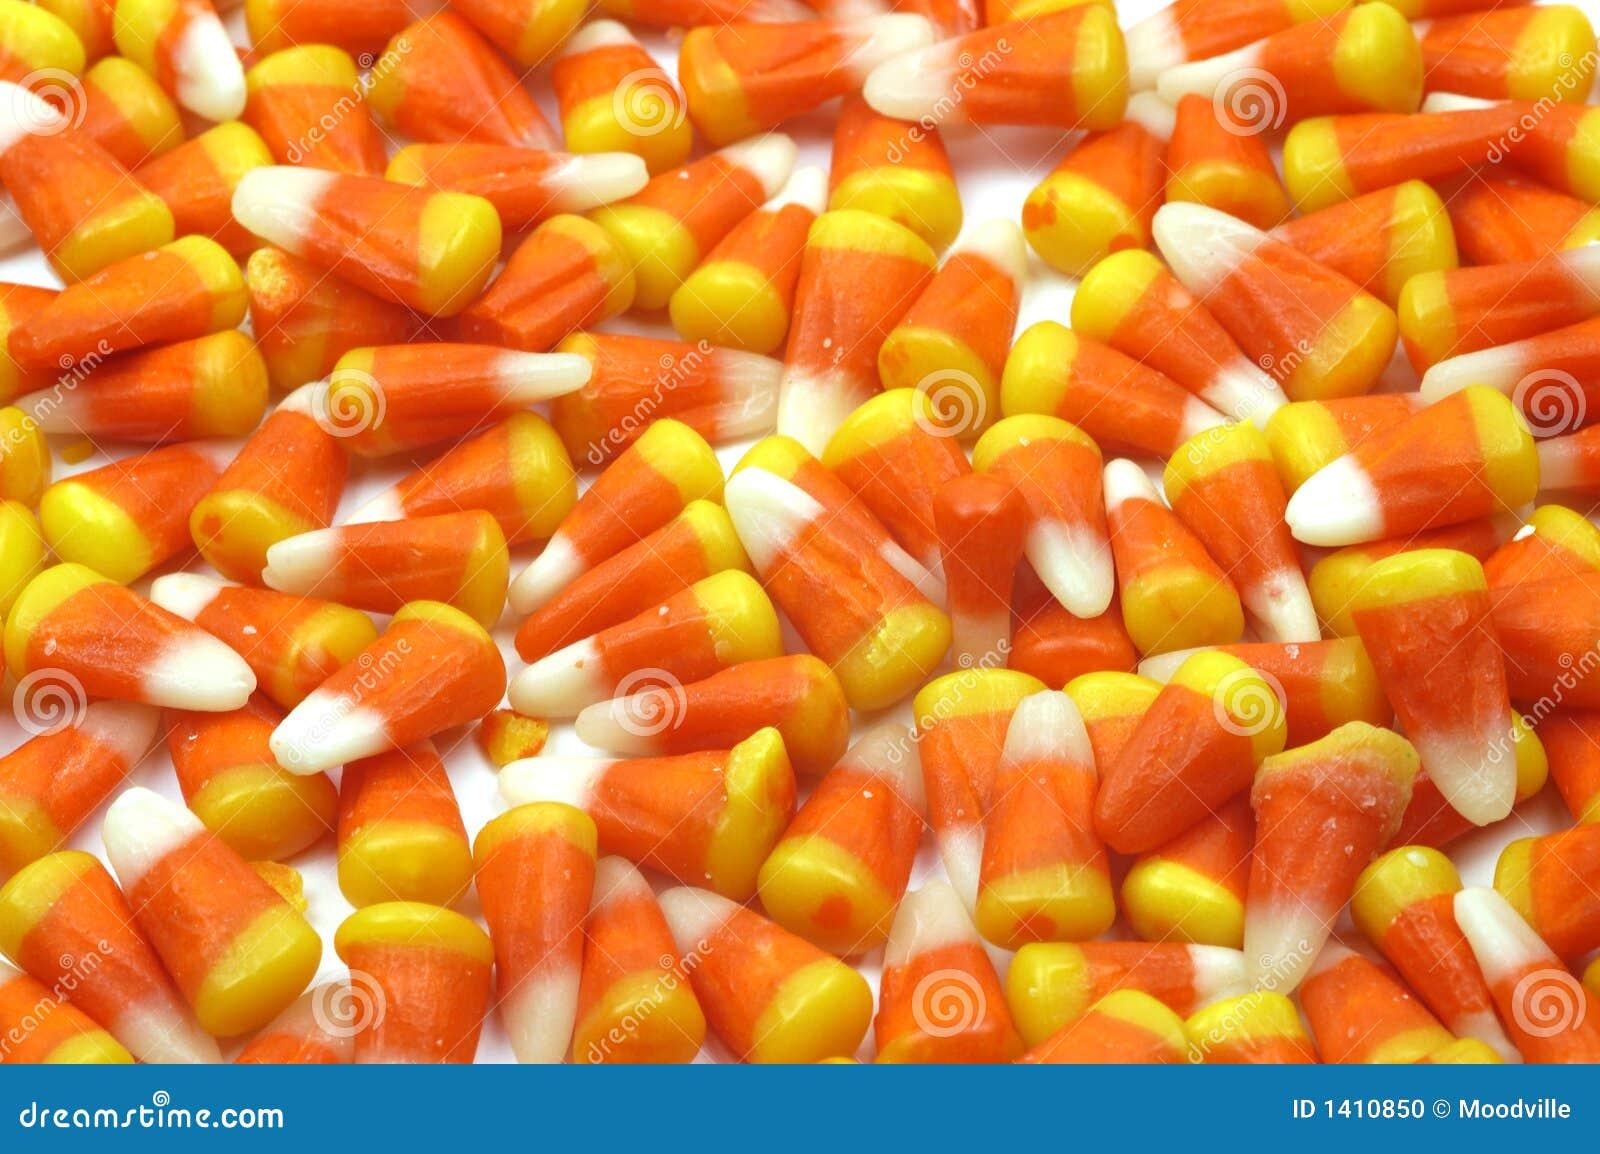 halloween candy corn background stock photo image 1410850